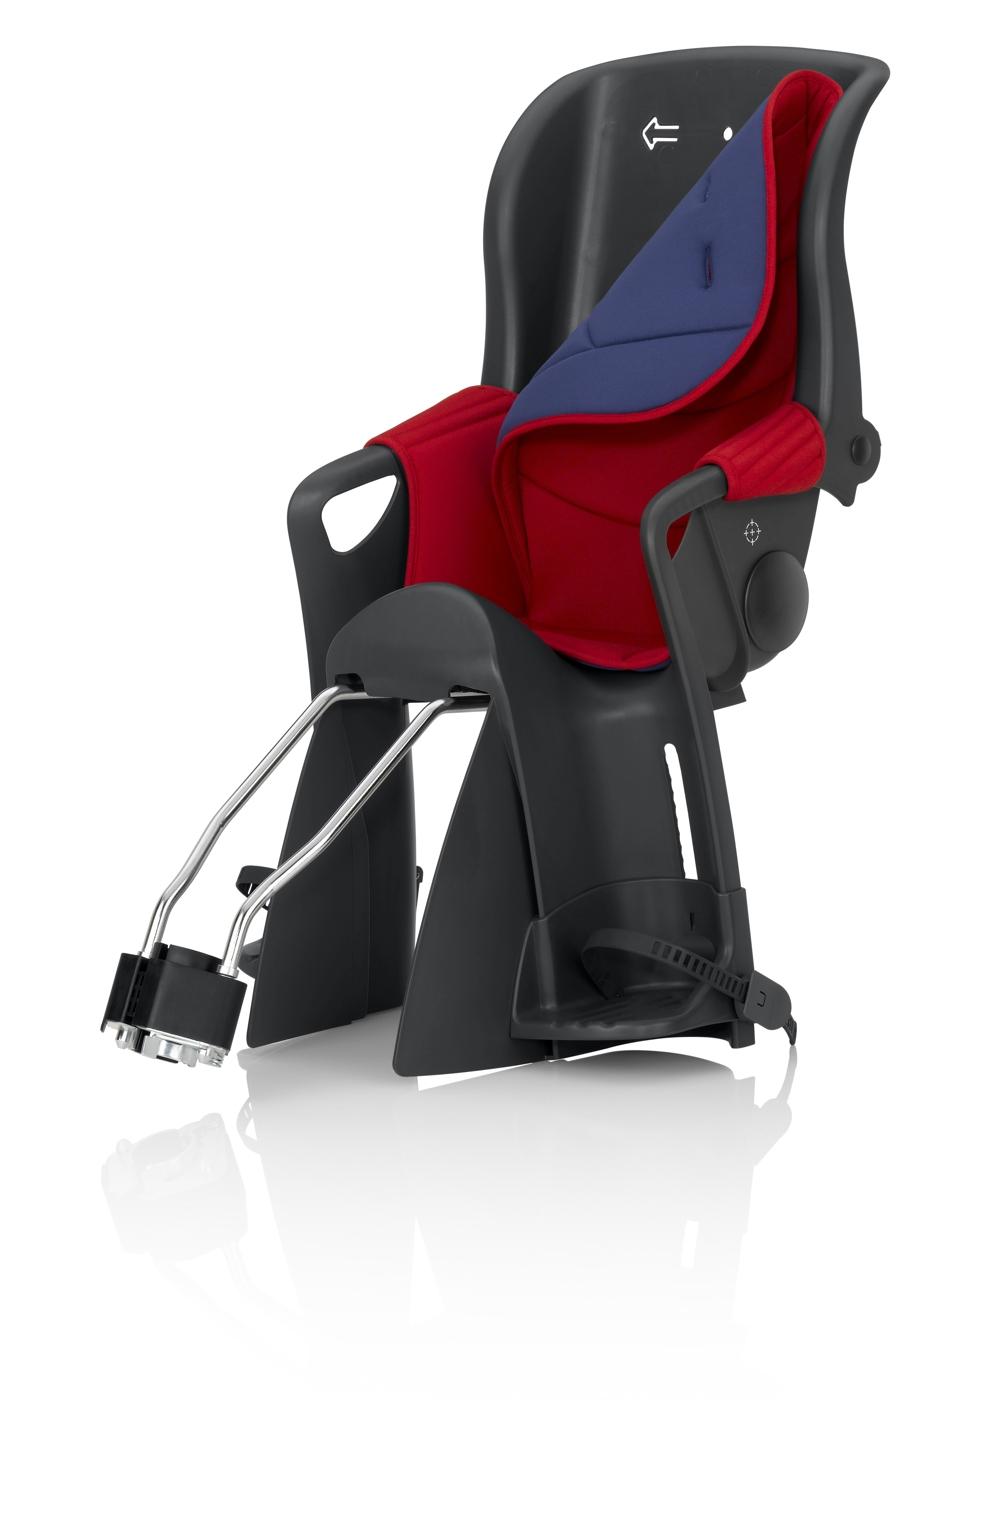 britax r mer jockey relax blue red. Black Bedroom Furniture Sets. Home Design Ideas